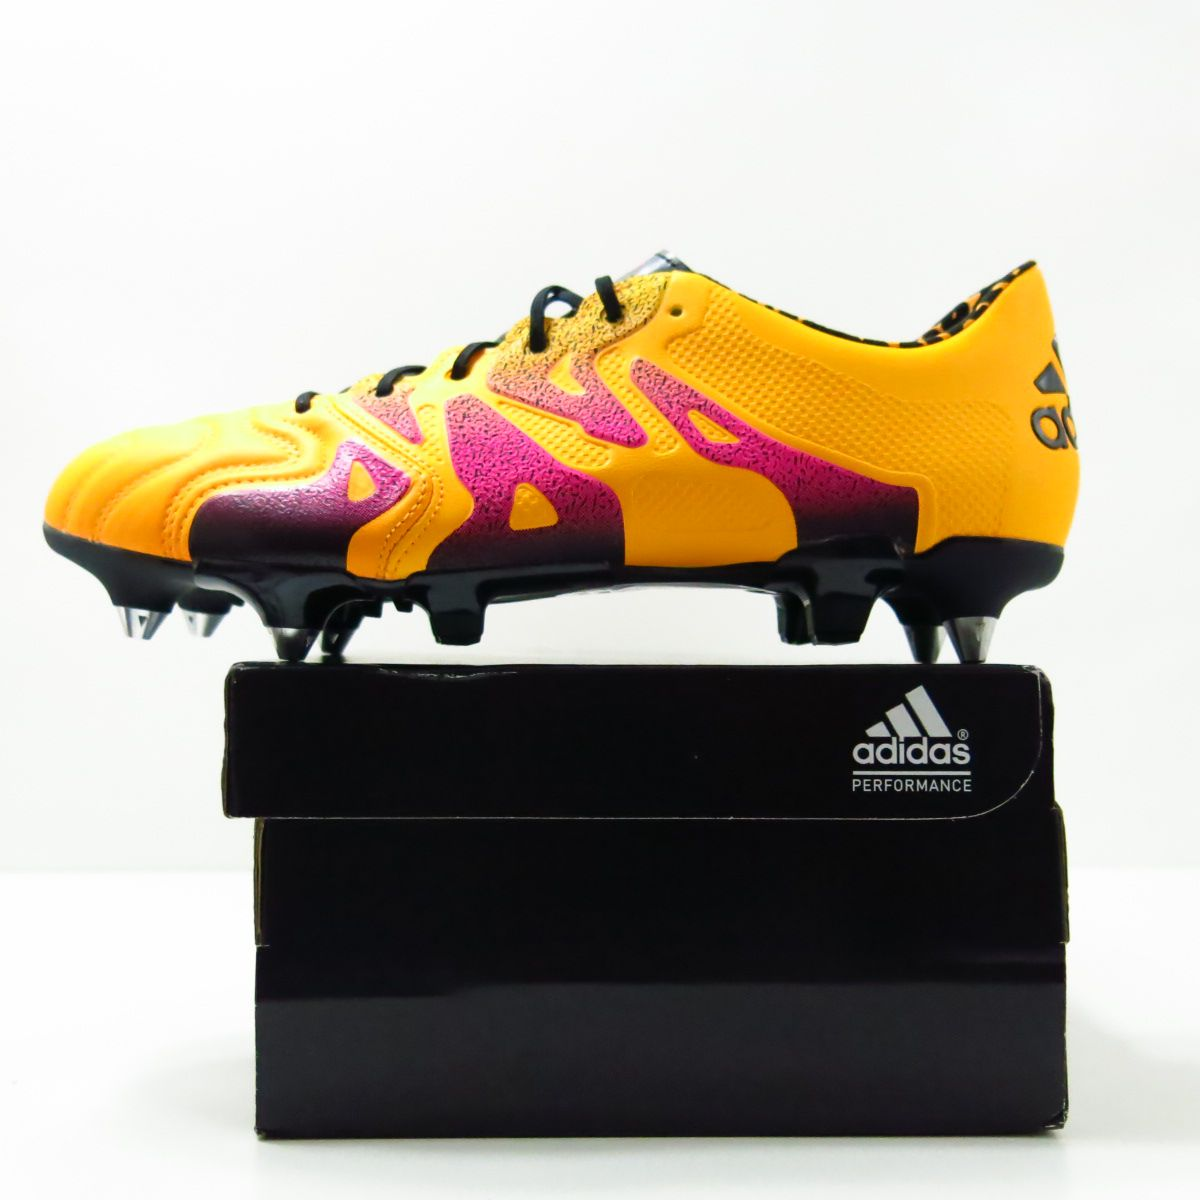 Chuteira Adidas X 15.1 Sg Trava Mista - Couro de Canguru